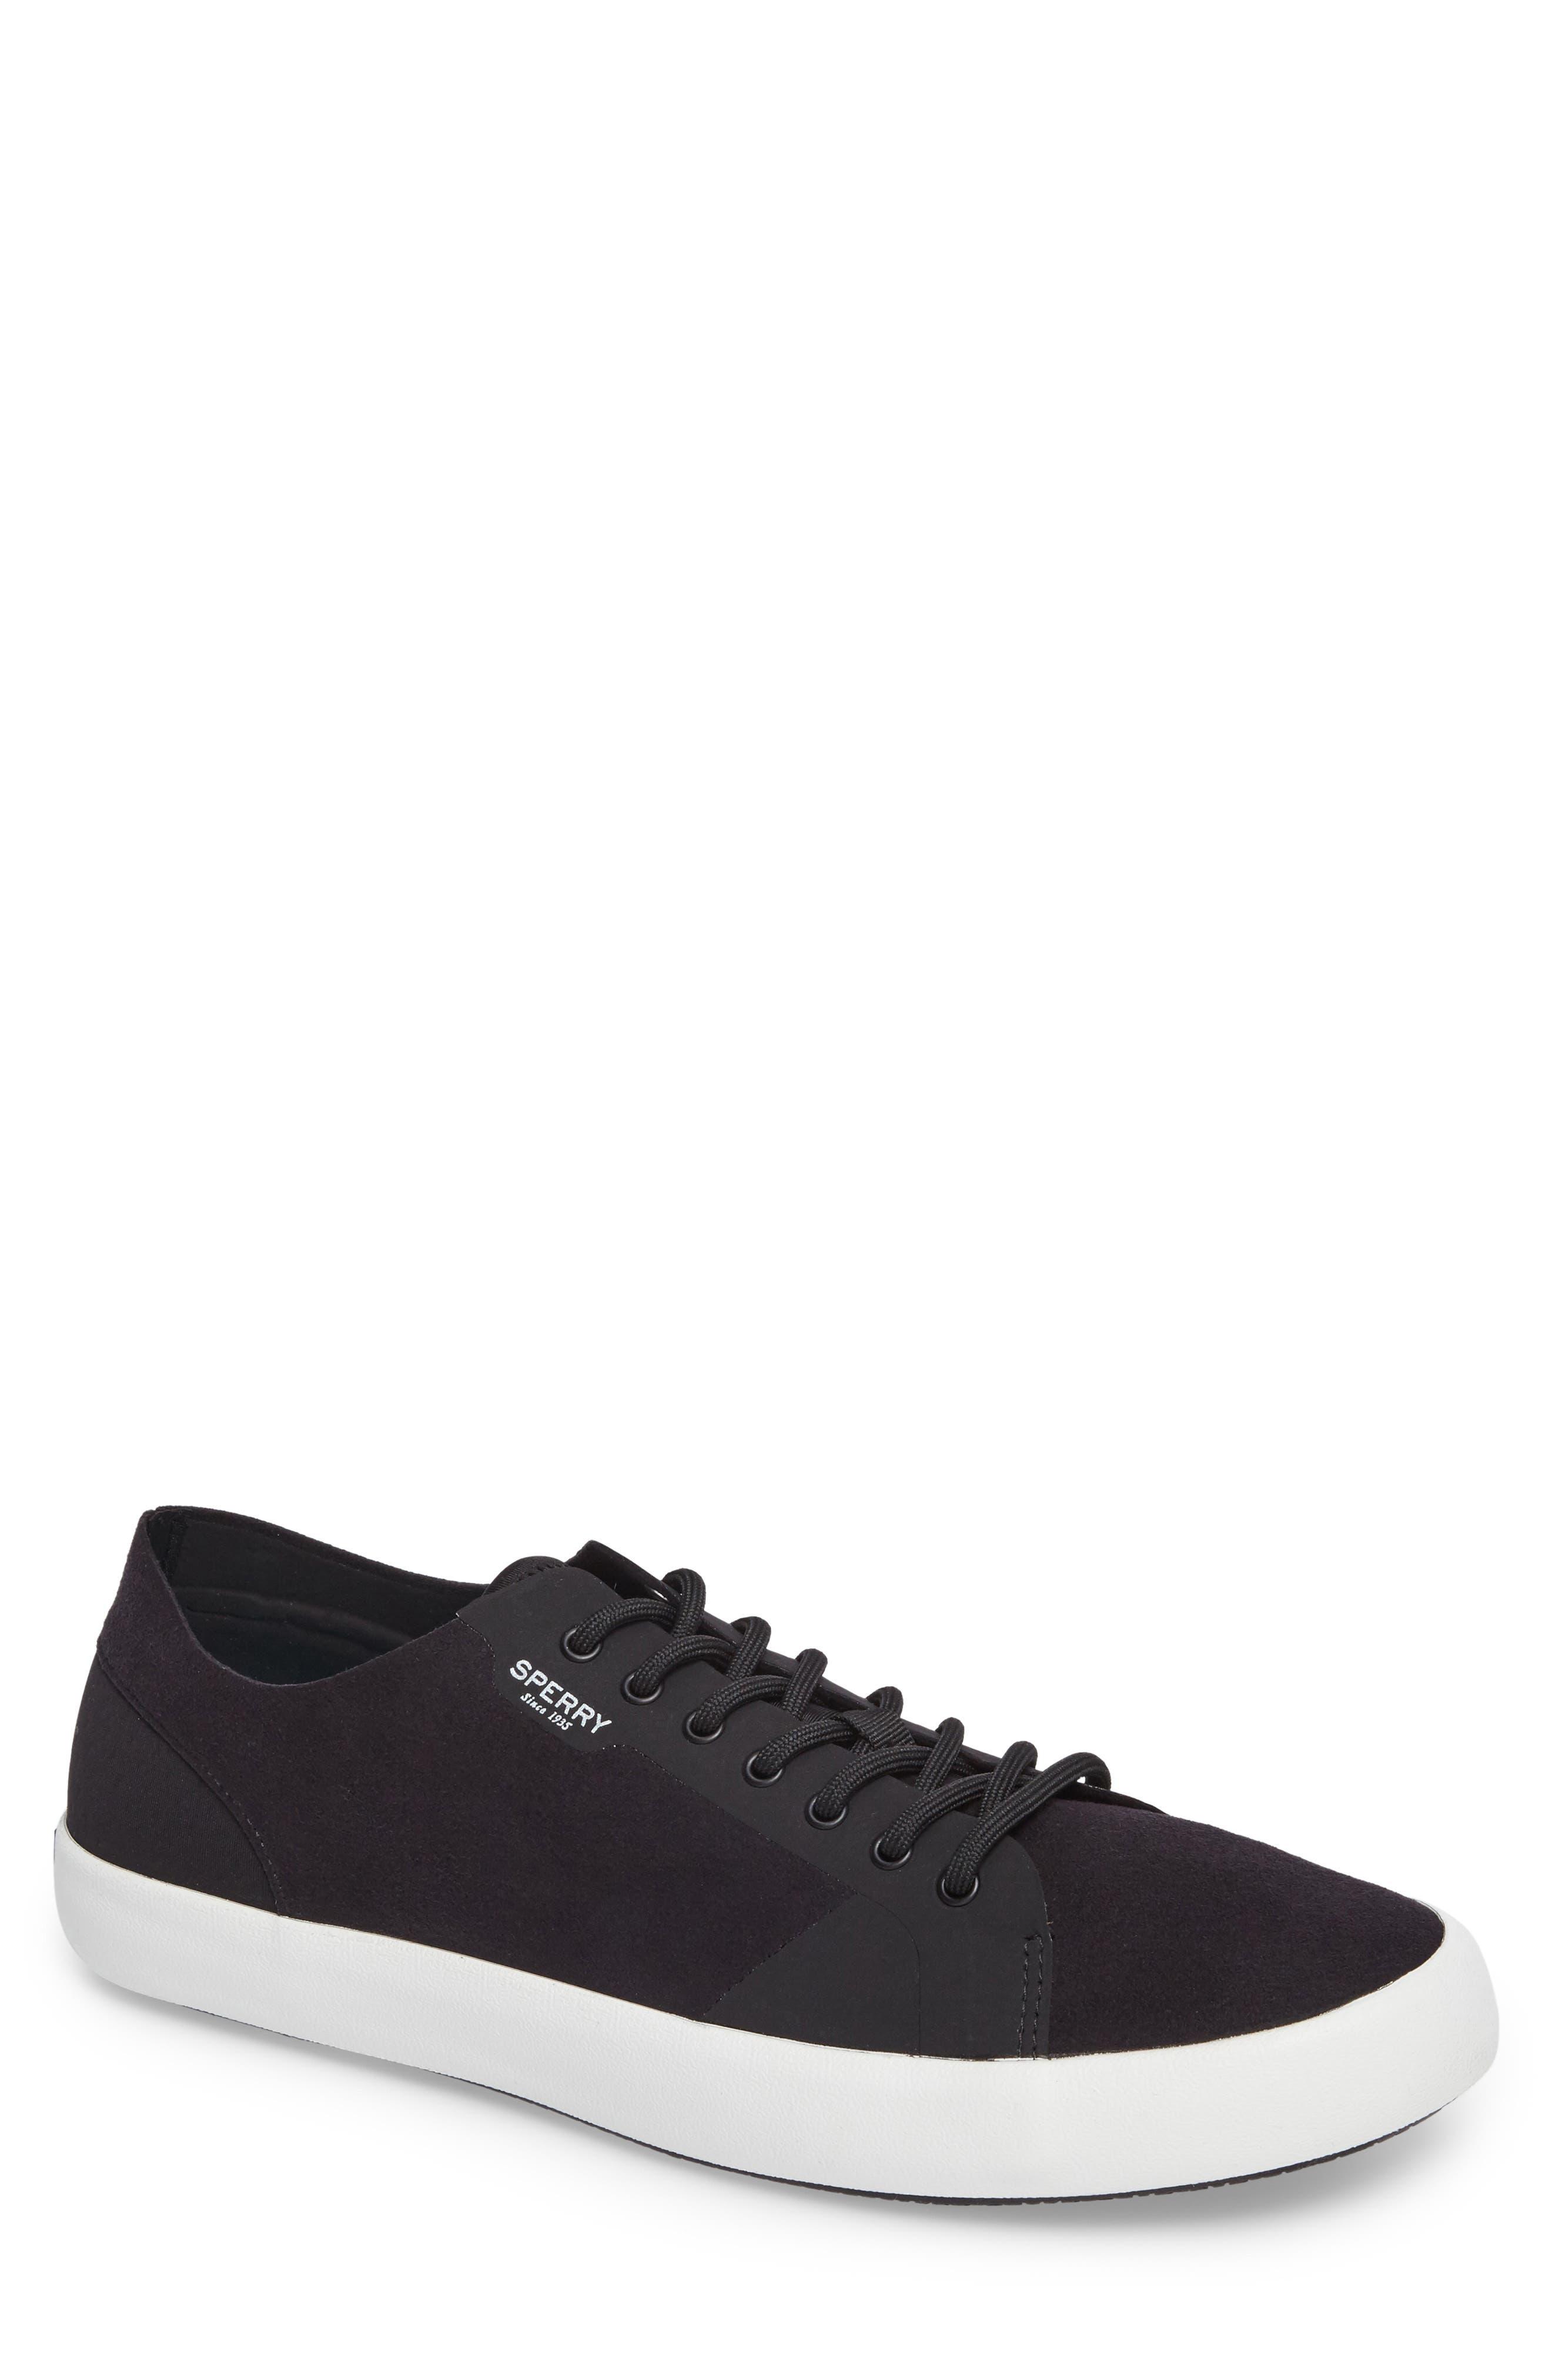 Alternate Image 1 Selected - Sperry Flex Deck LTT Sneaker (Men)